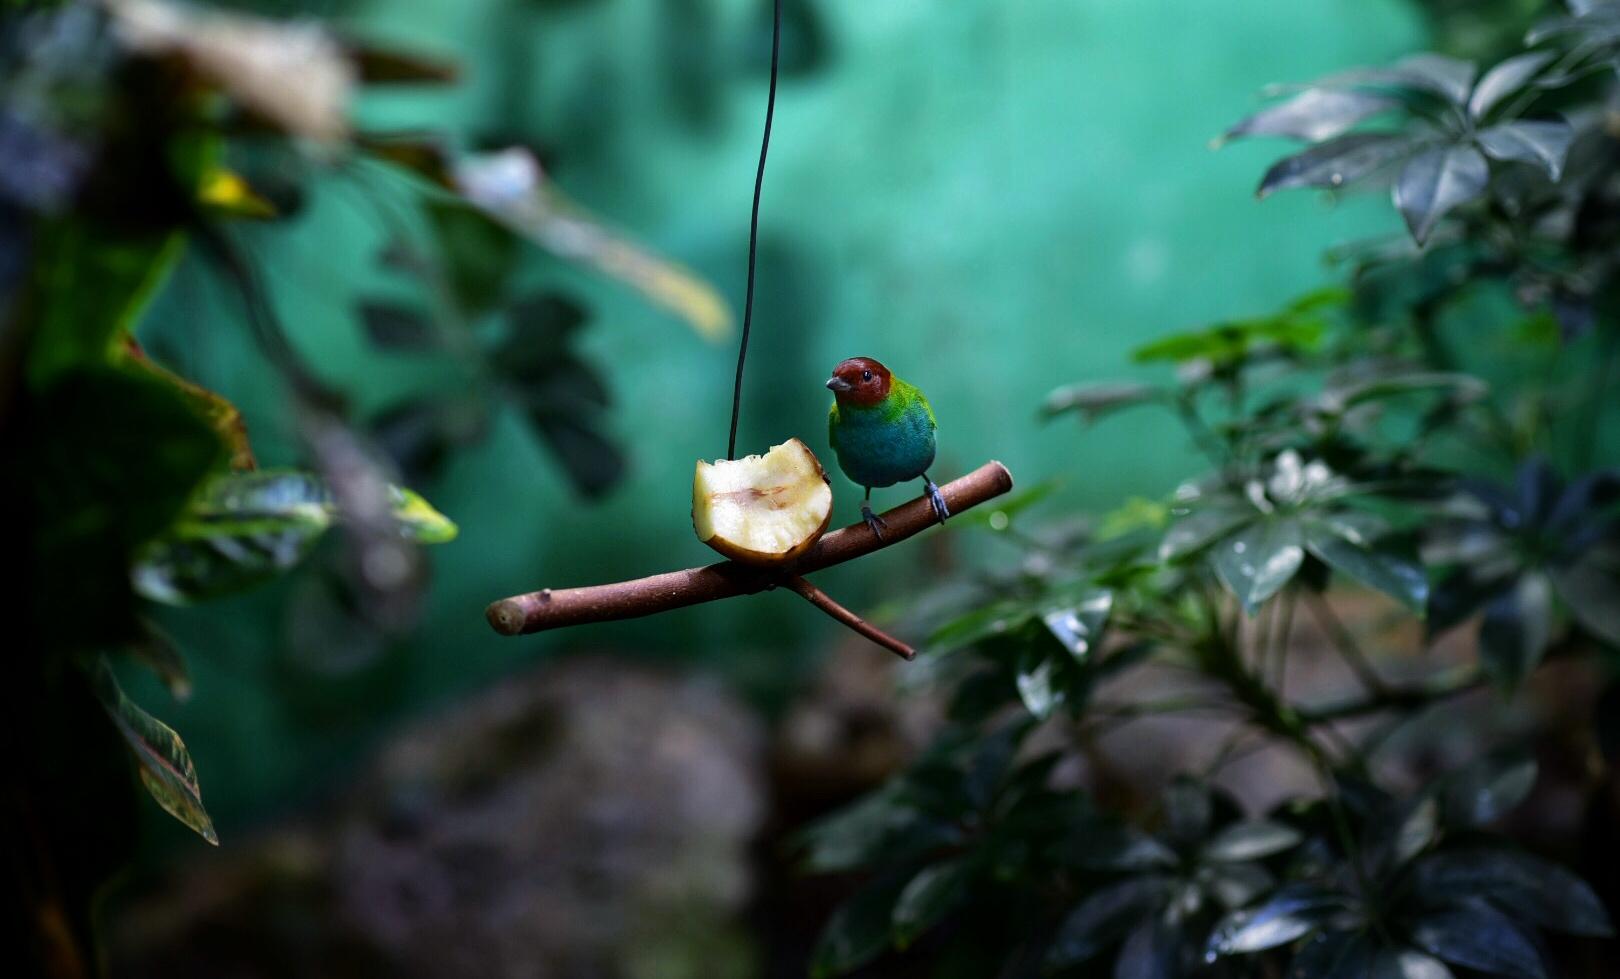 Vogel isst Apfel